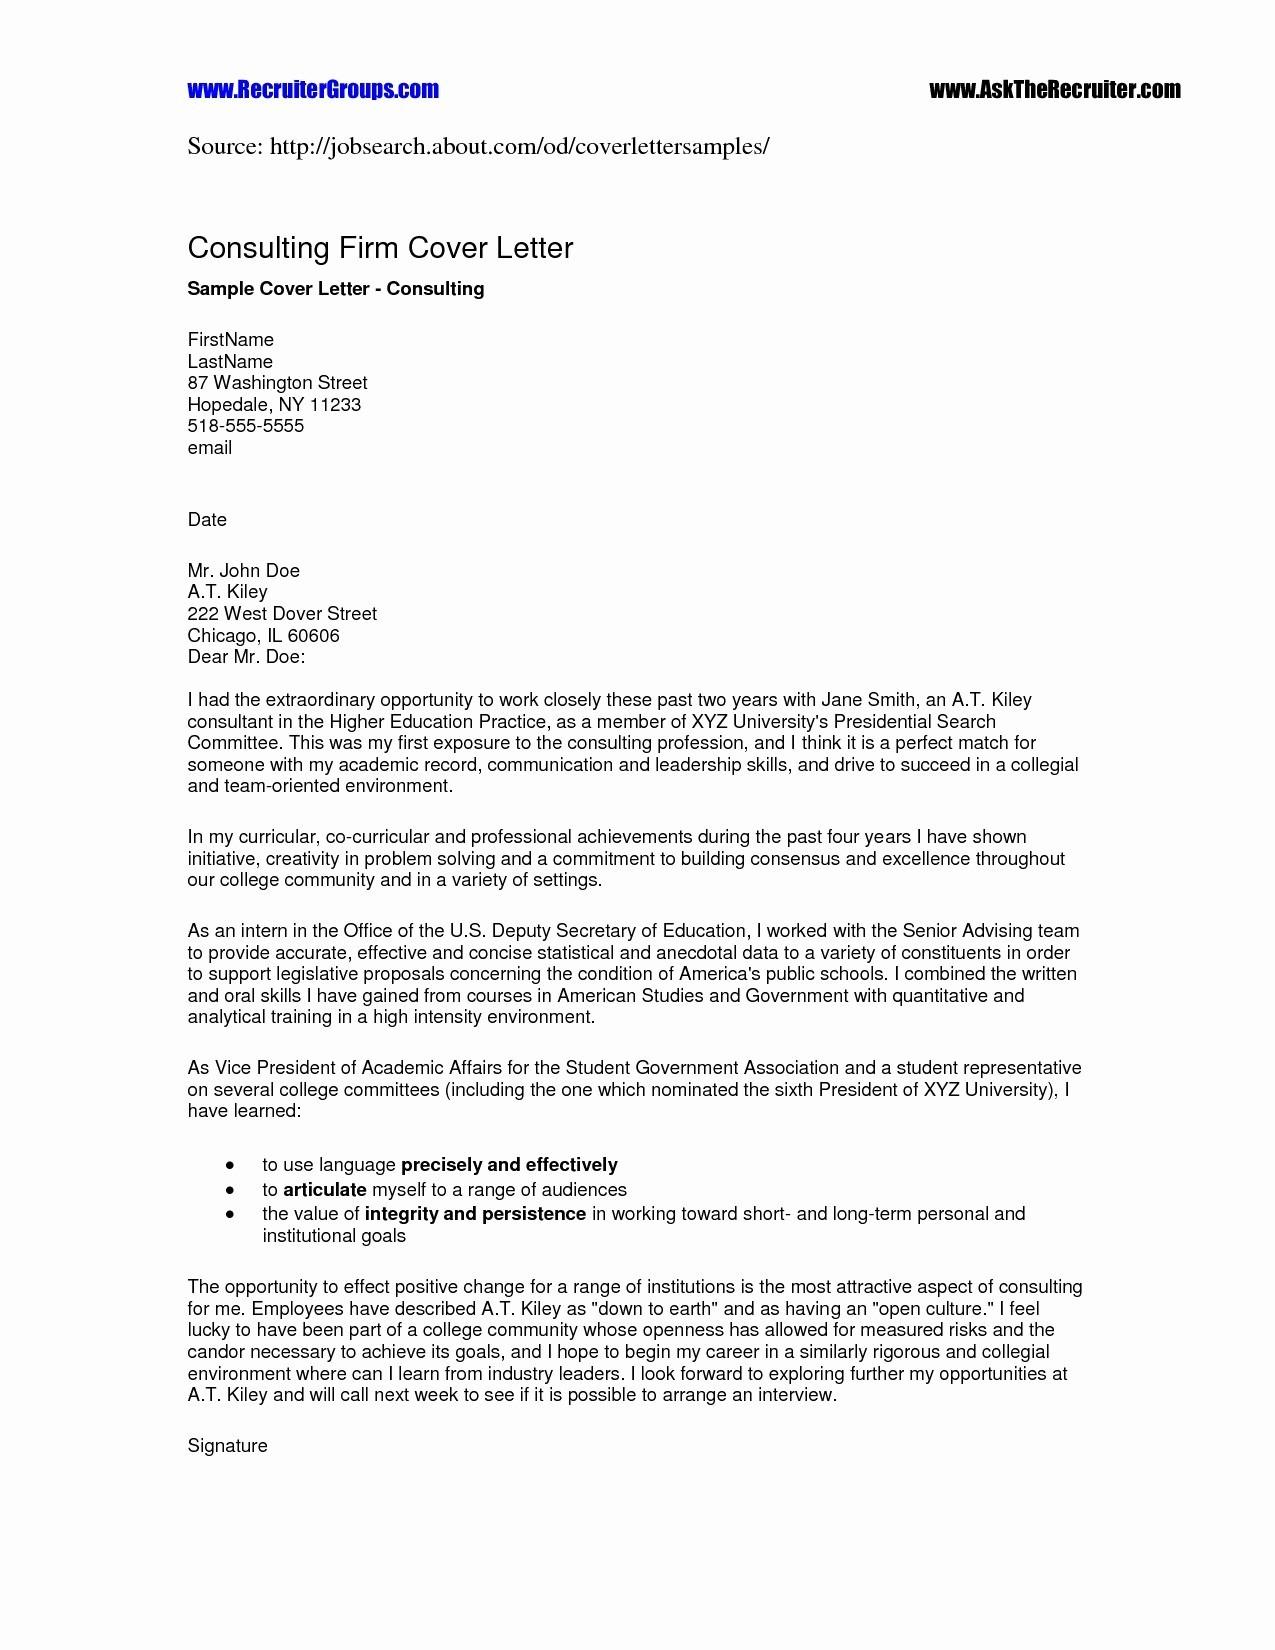 Free Cover Letter Template for Job Application - Resume and Cover Letter Templates Fresh Teacher Cover Letter